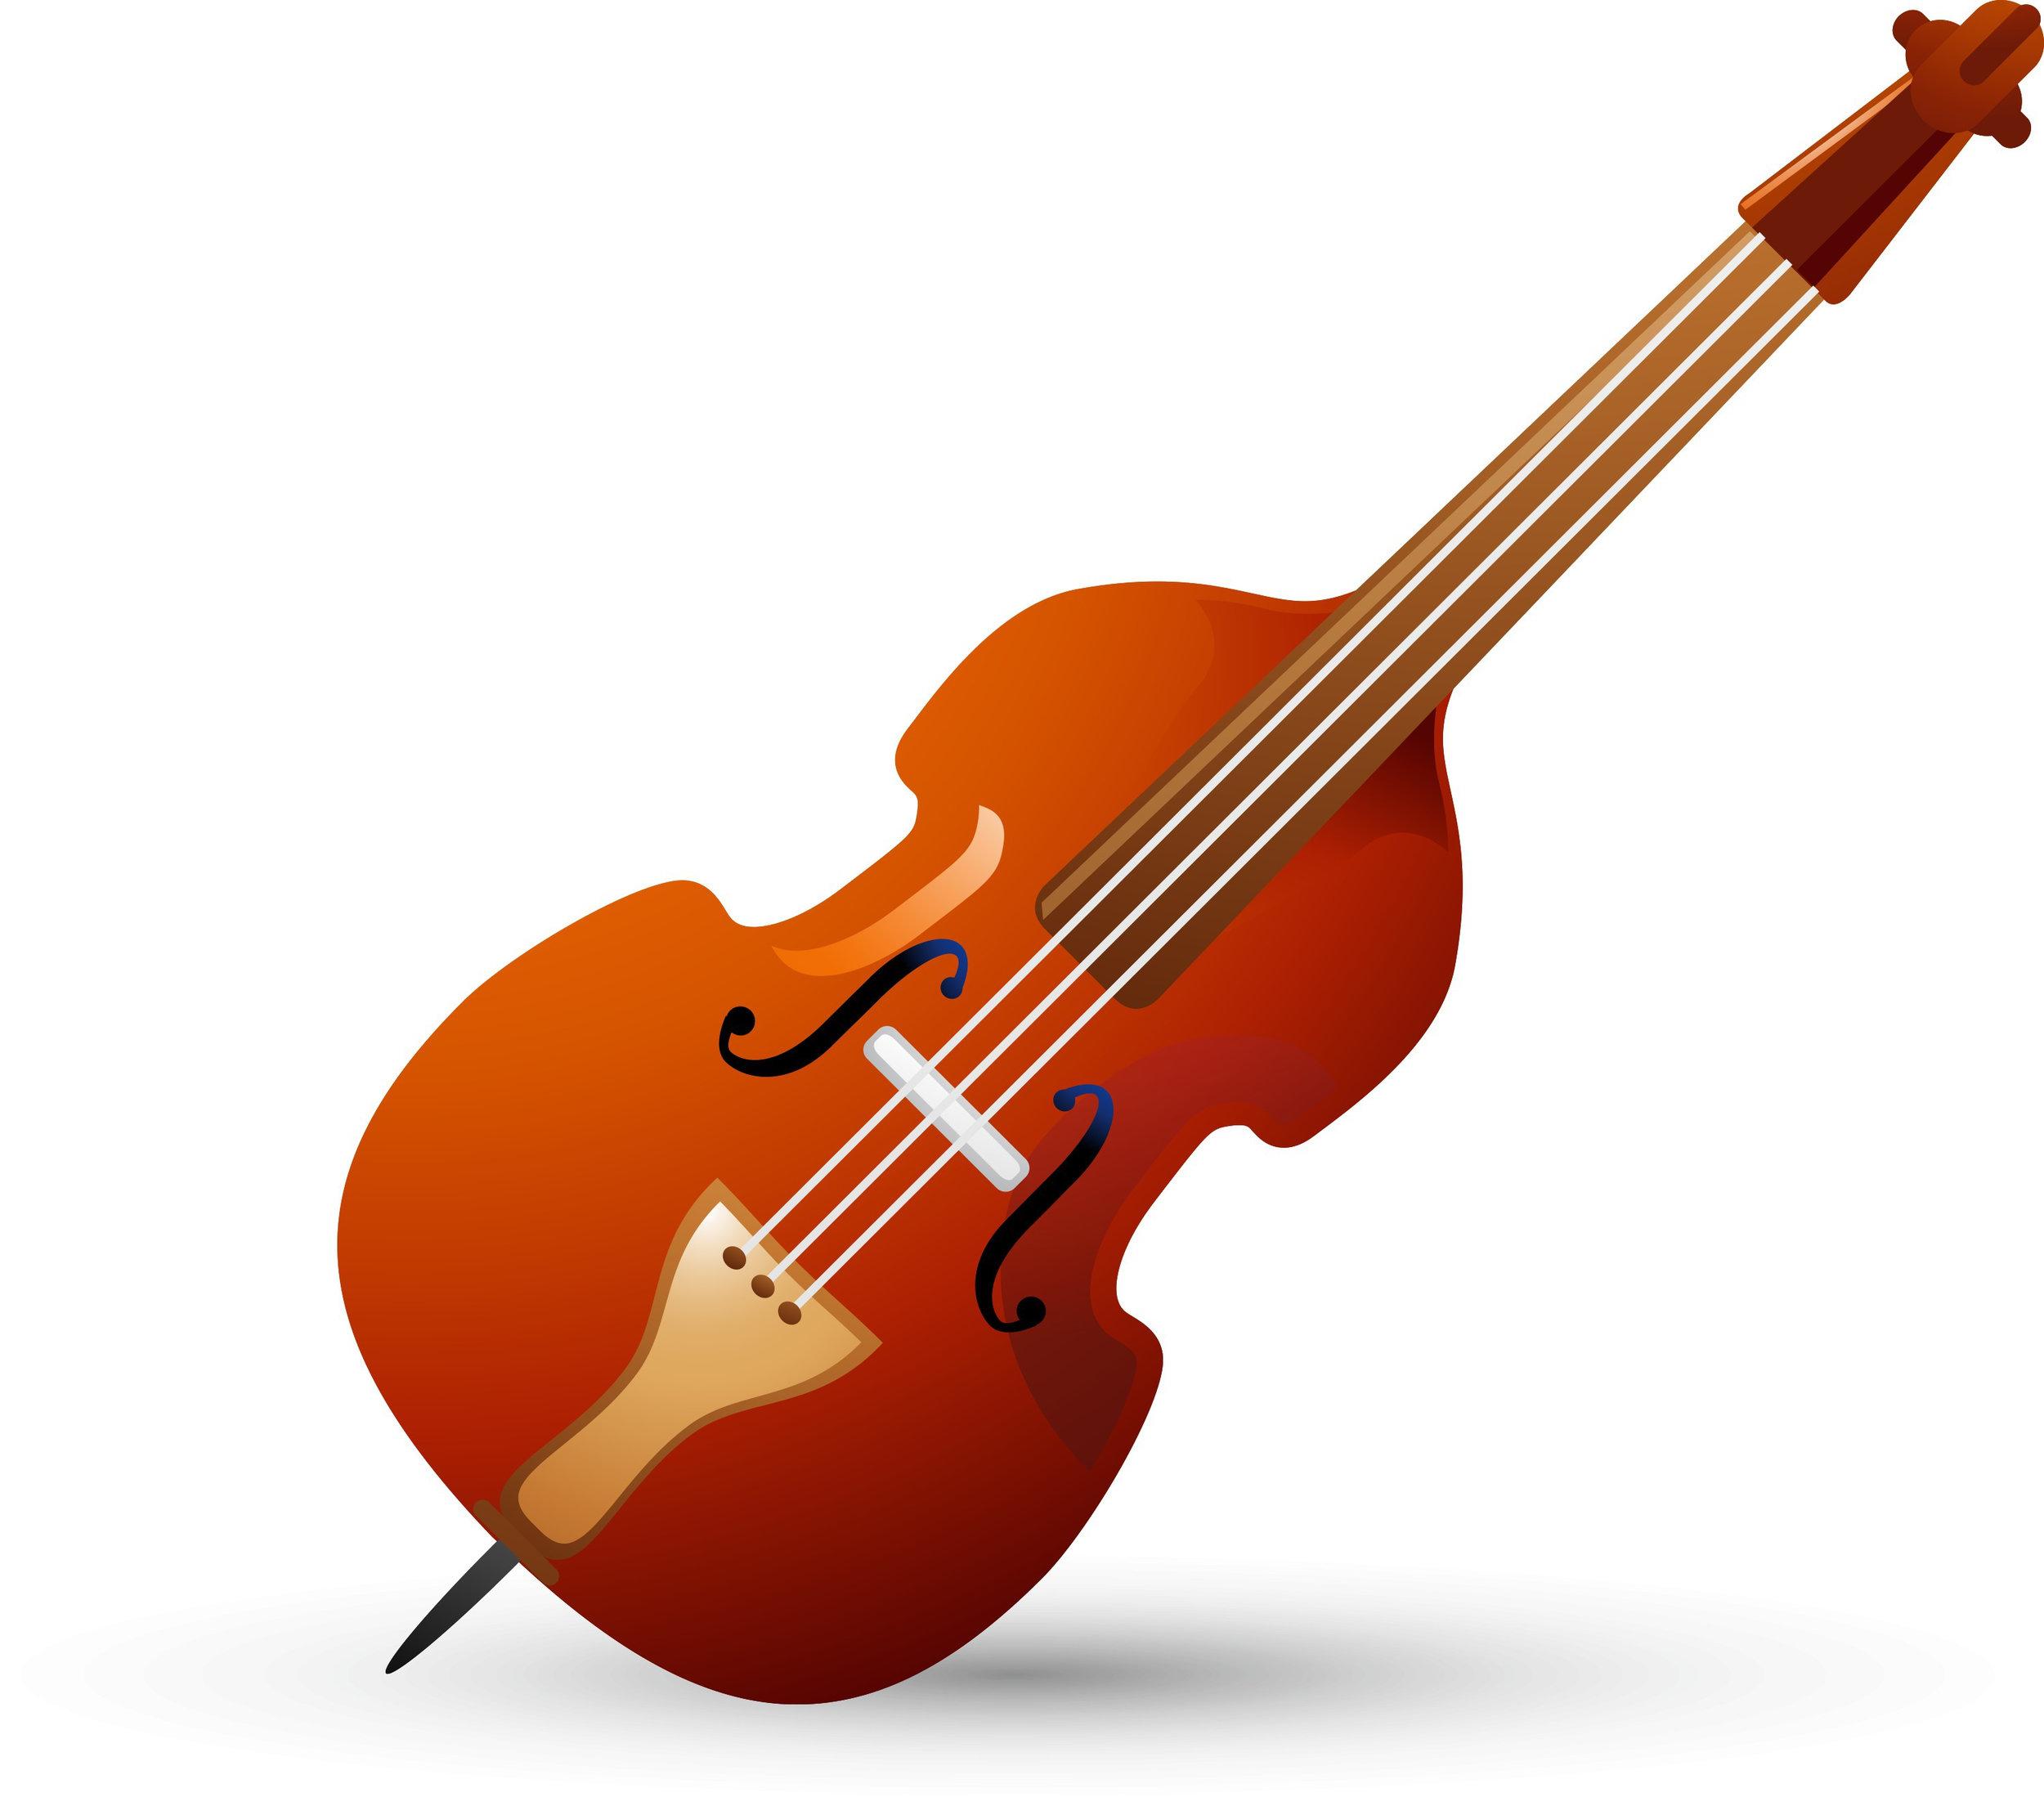 cello-lite-music-icons_MJIKtpId_L.jpg